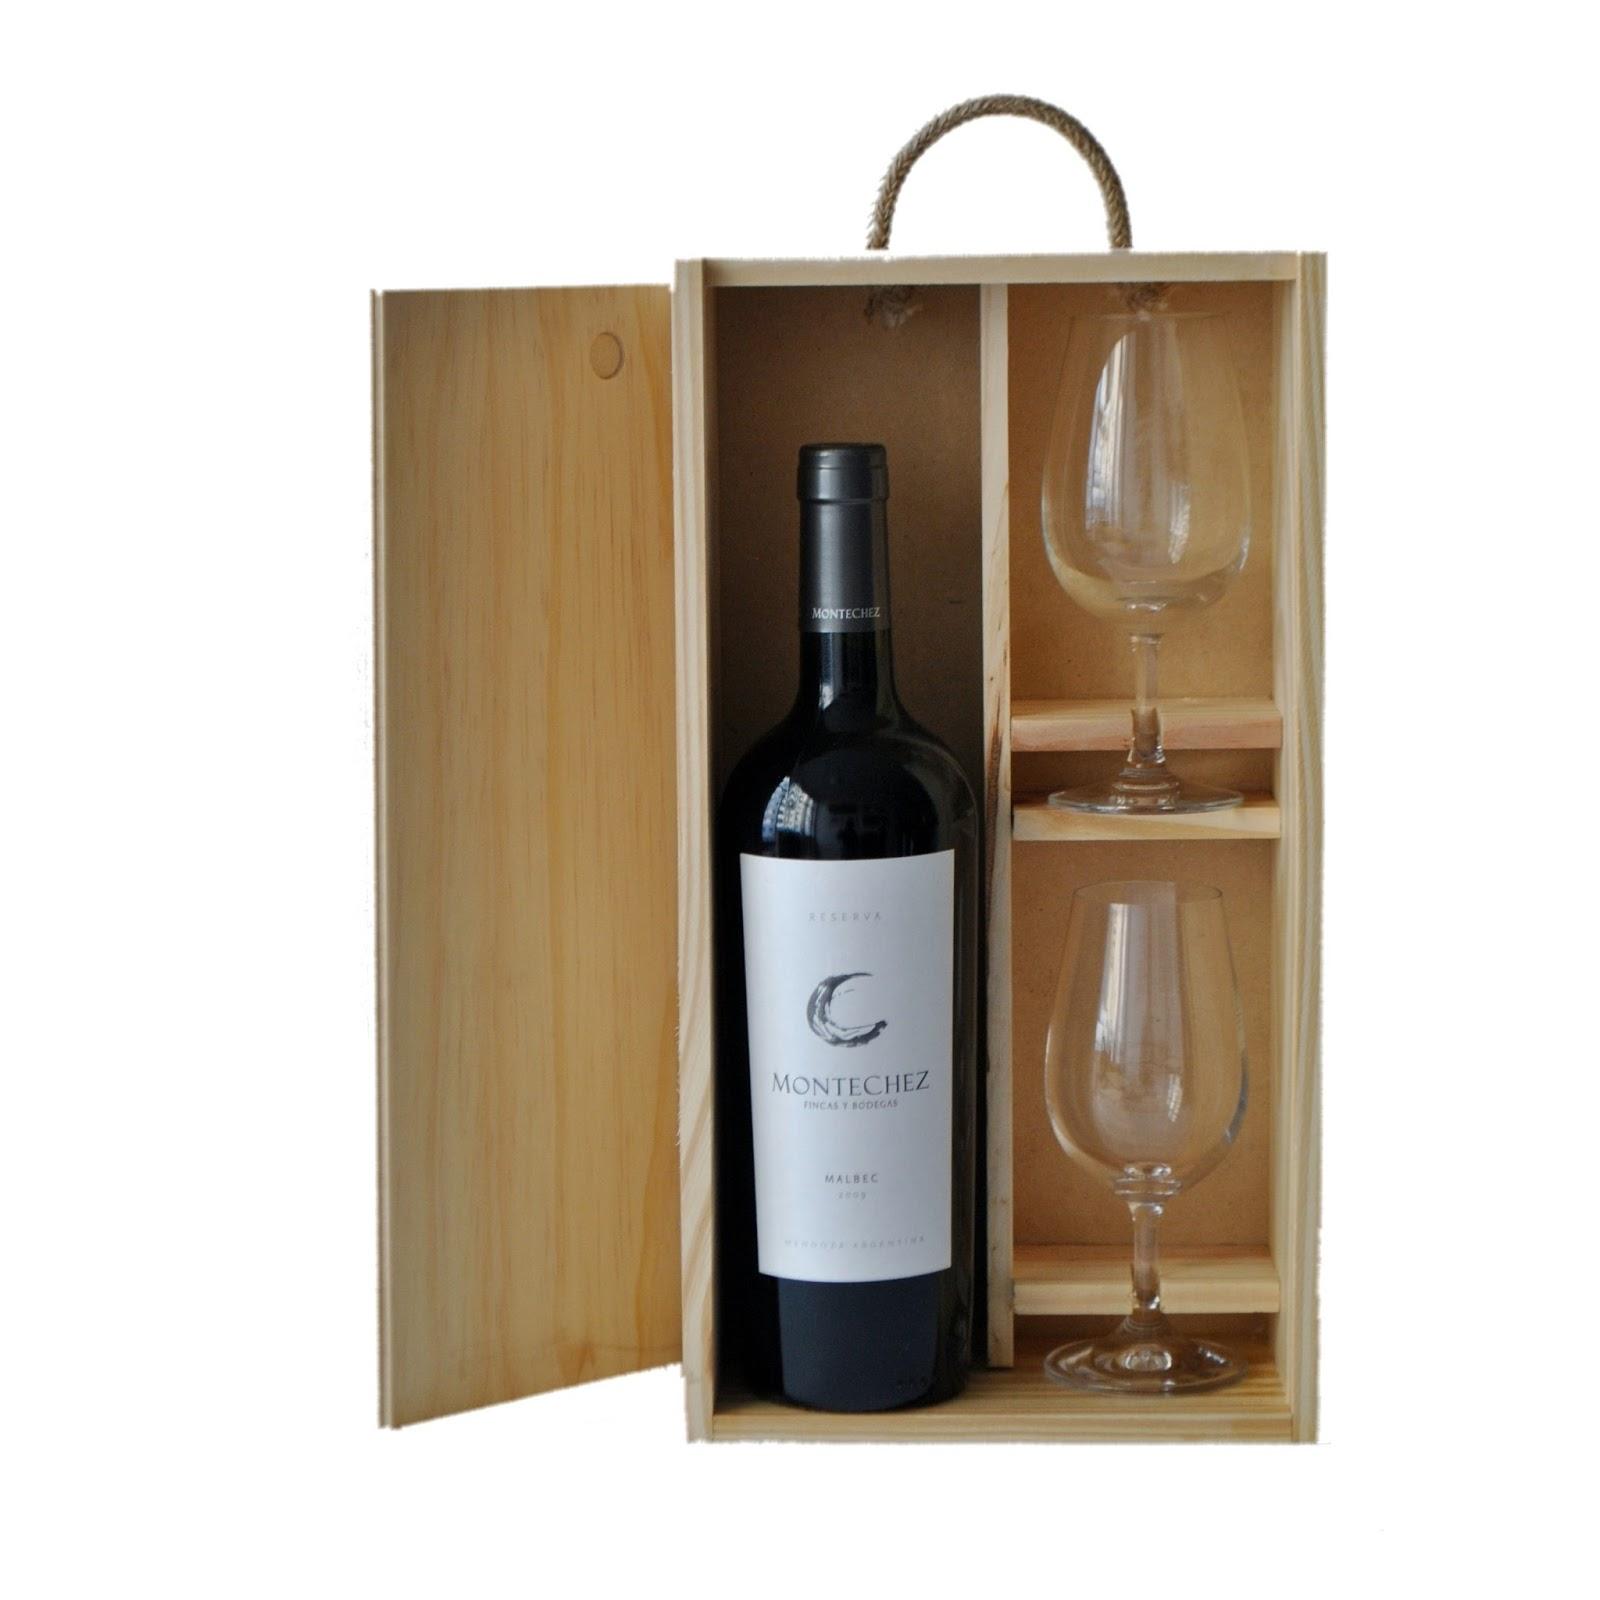 Cajas madera para vino comprar estuche de madera con - Cajas de vino de madera decoradas ...